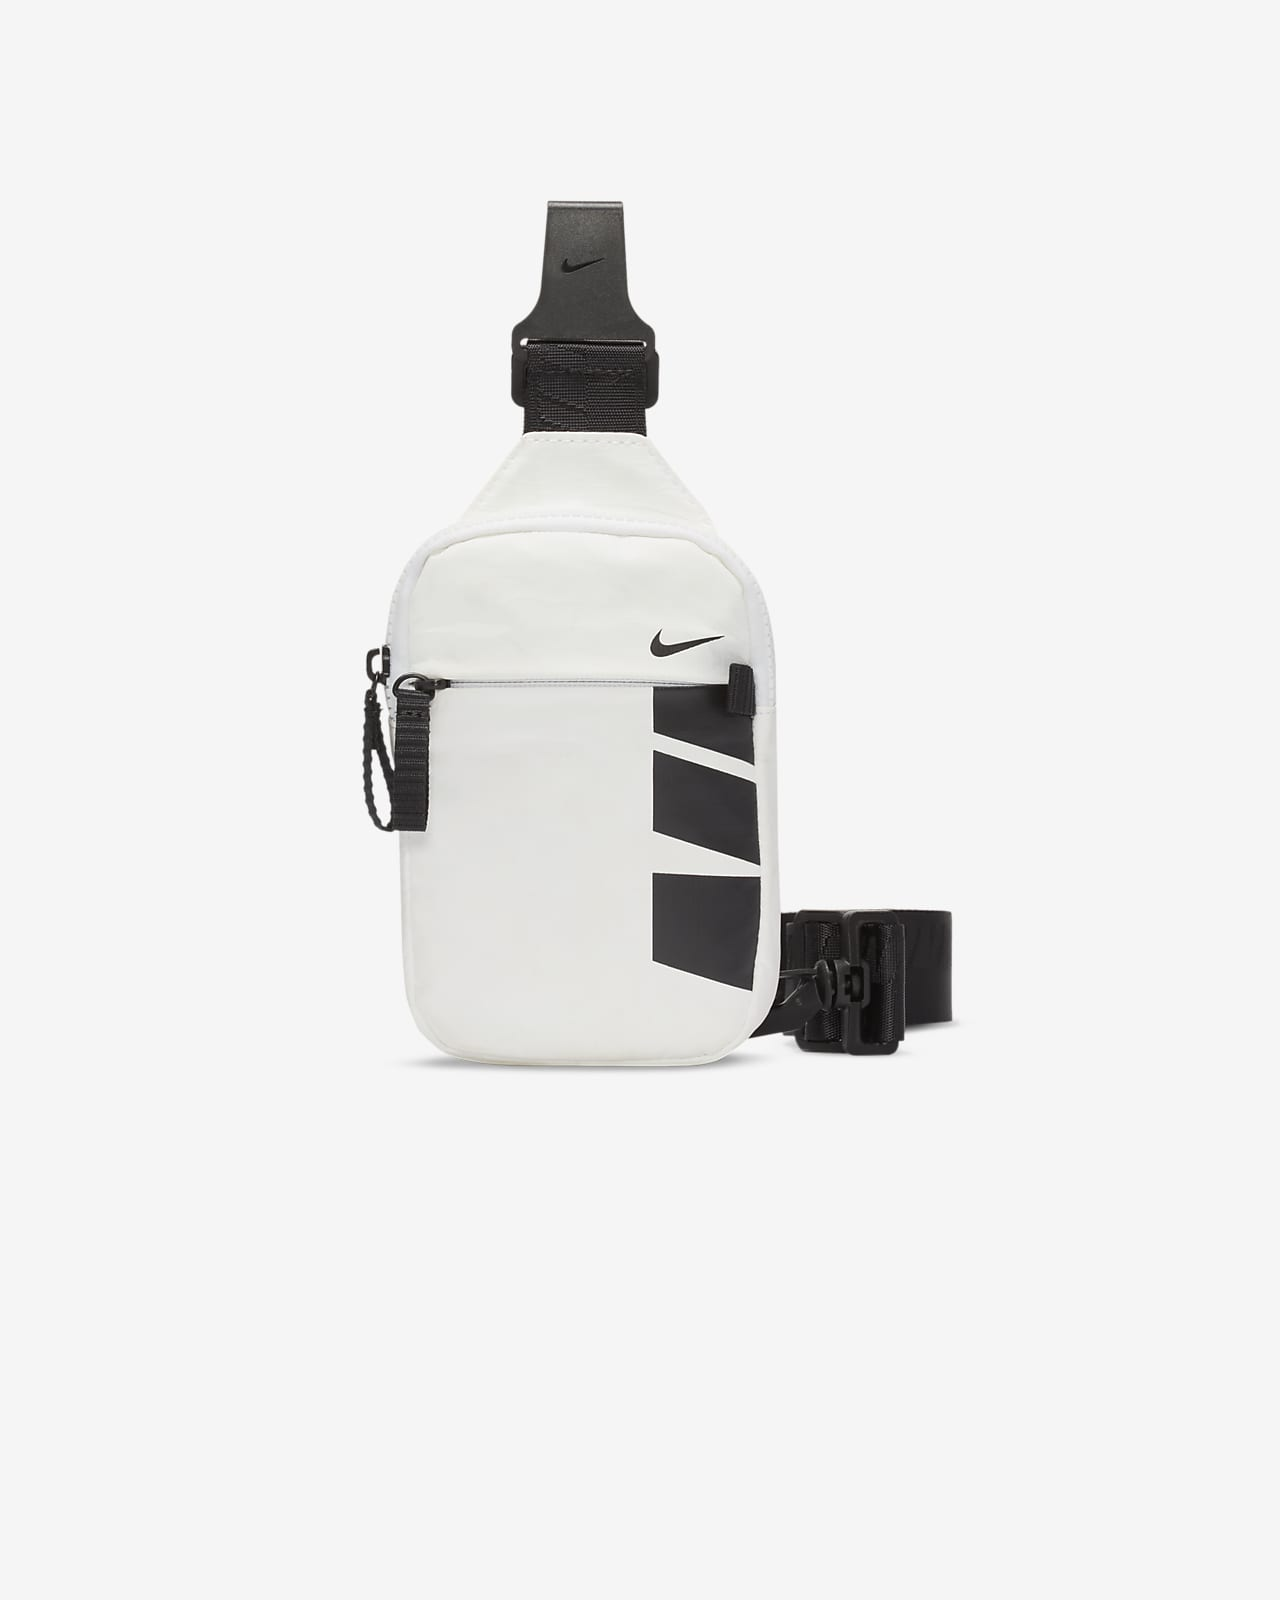 Nike Sportswear Small Items Bag